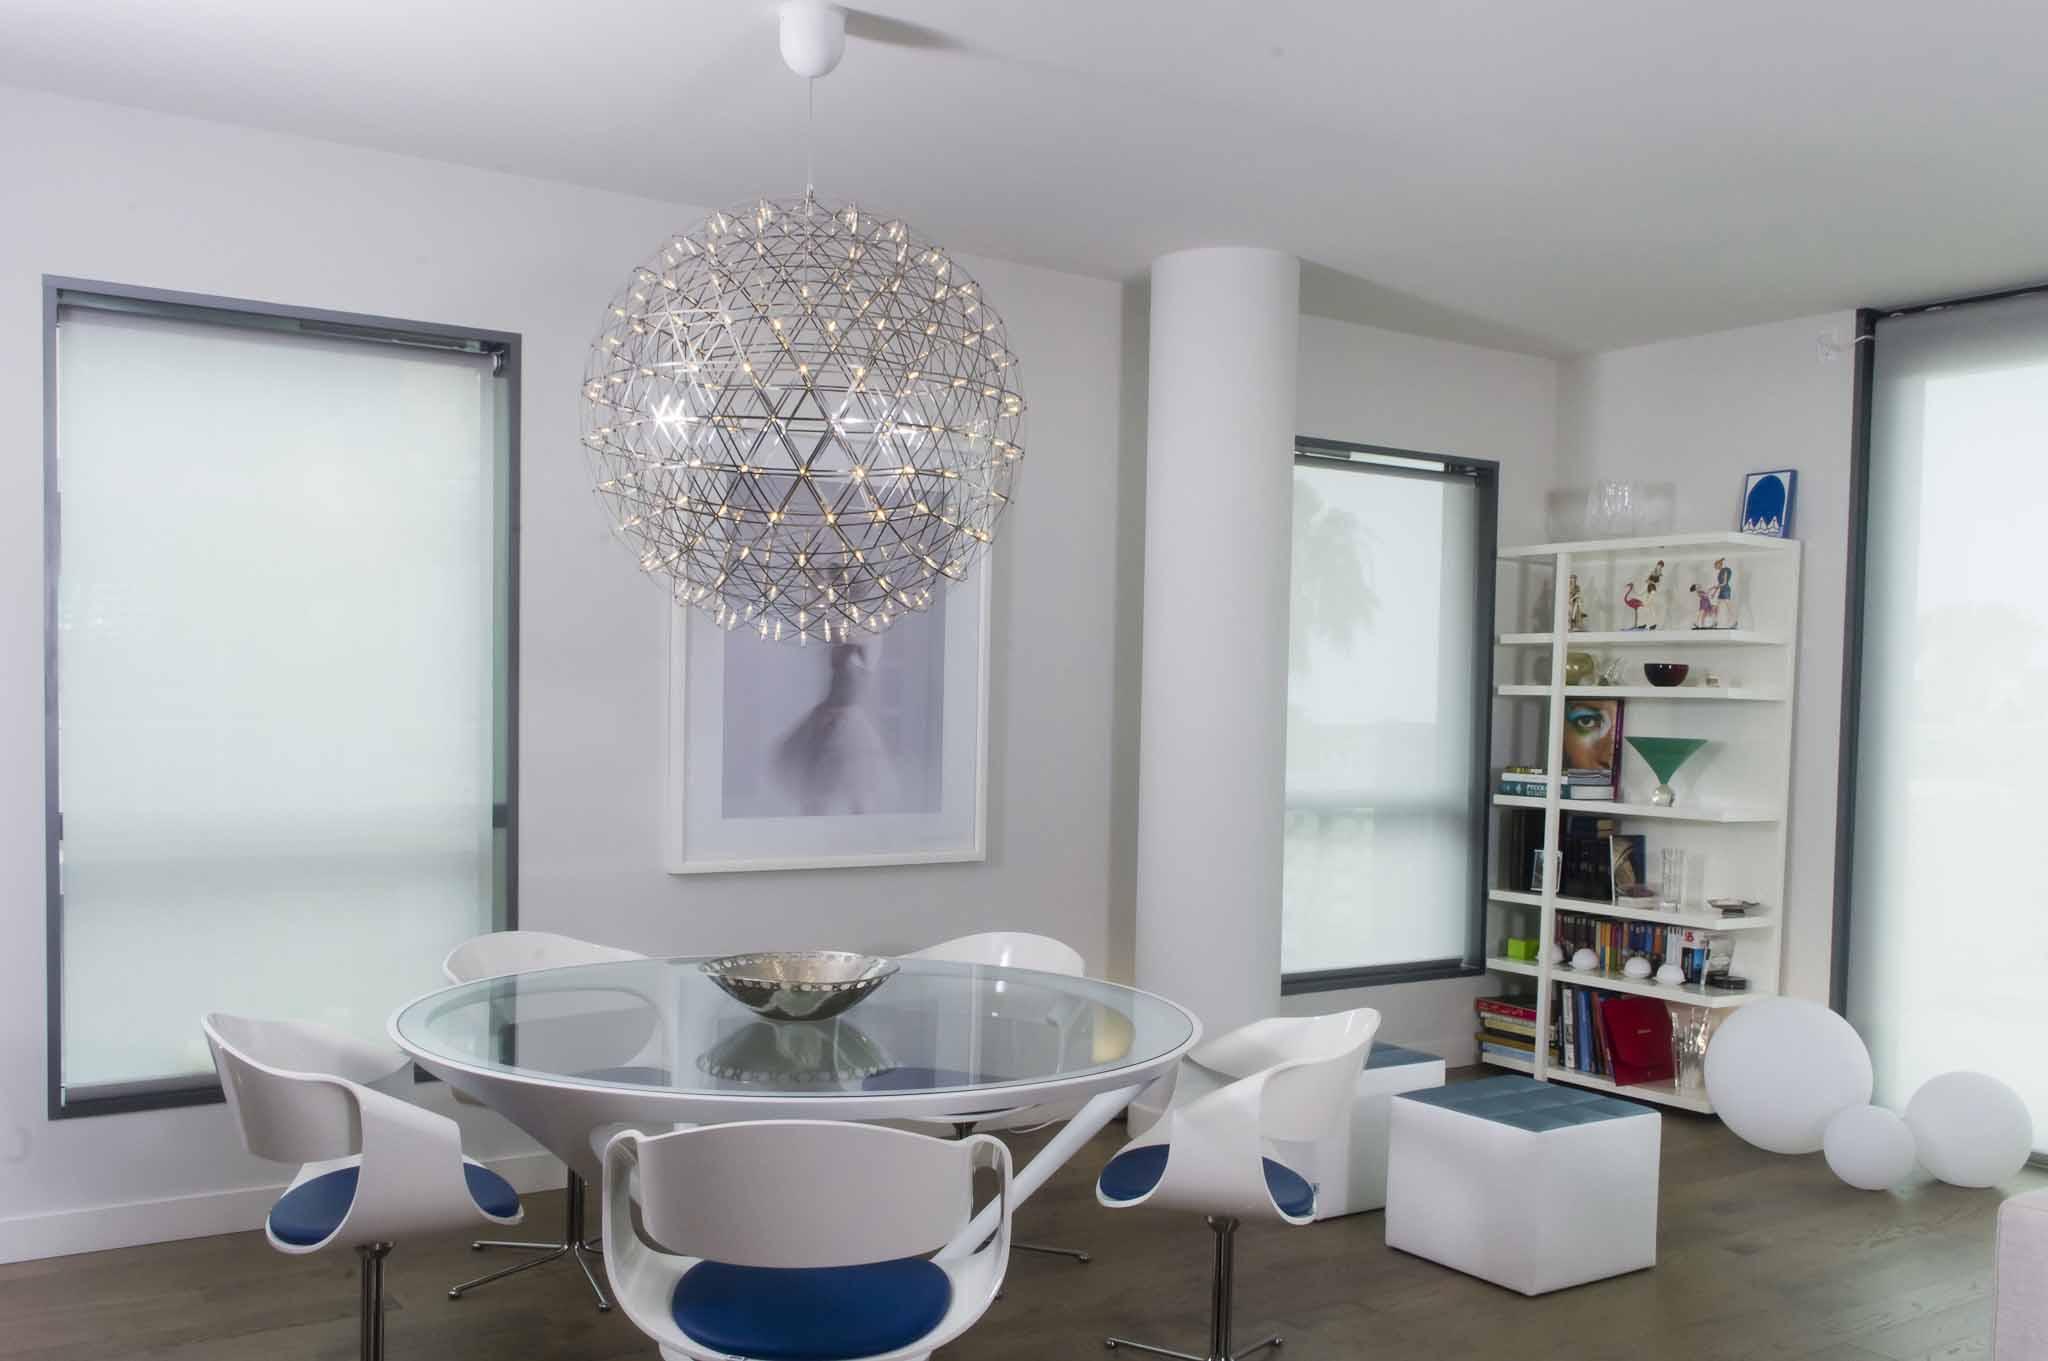 Living room05web.JPG